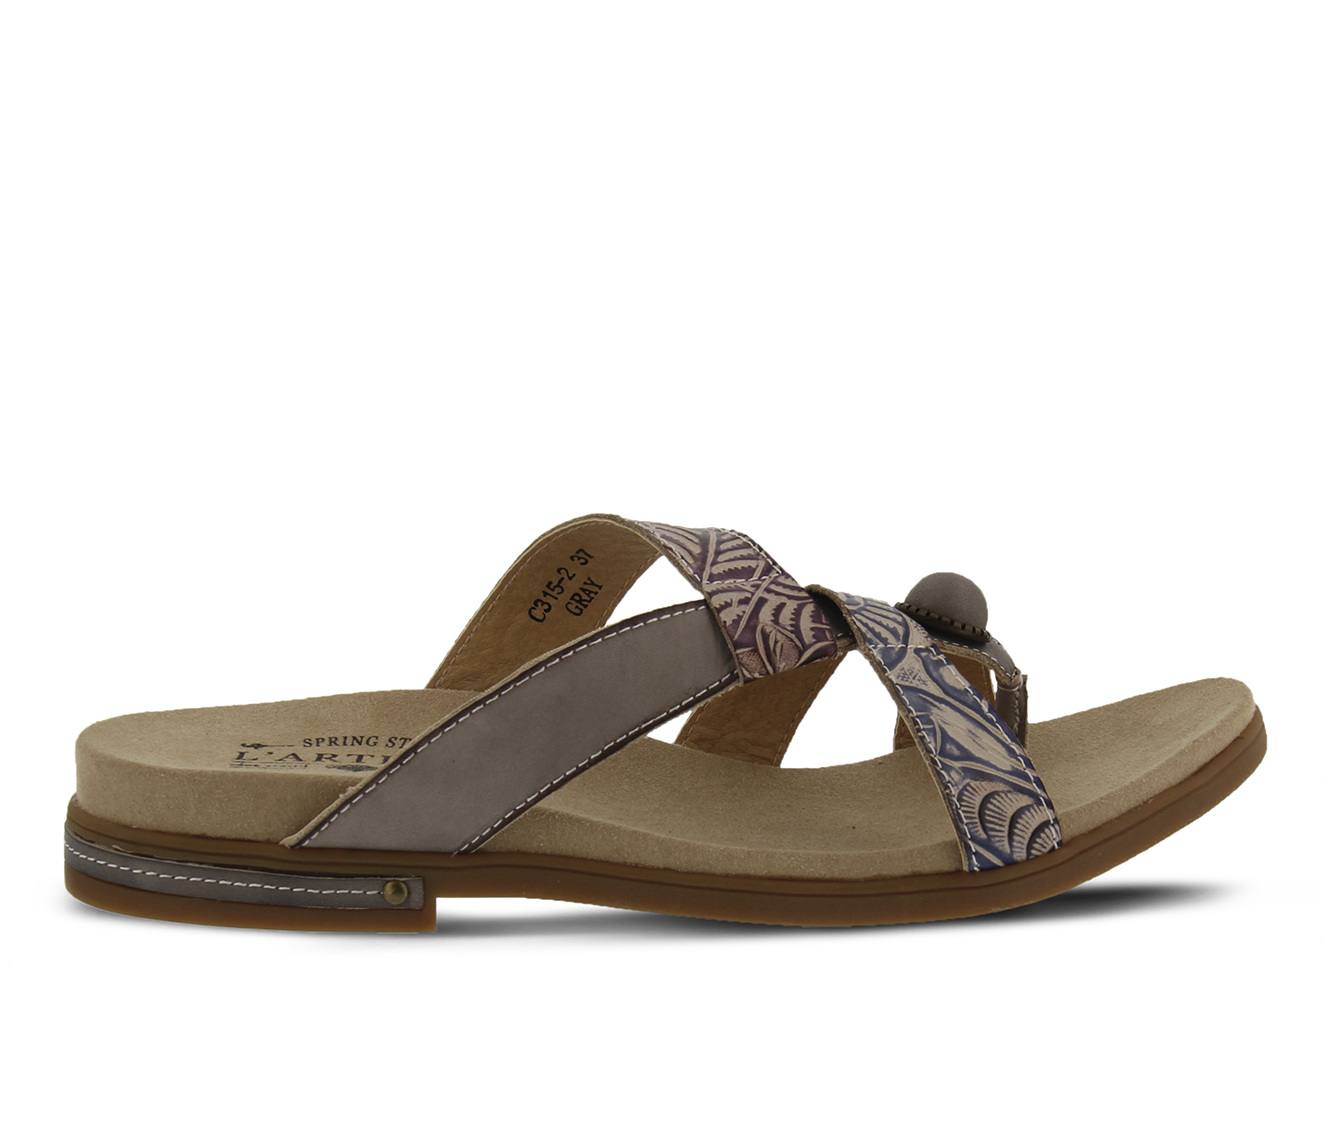 L'Artiste Pierce Women's Sandal (Gray Leather)